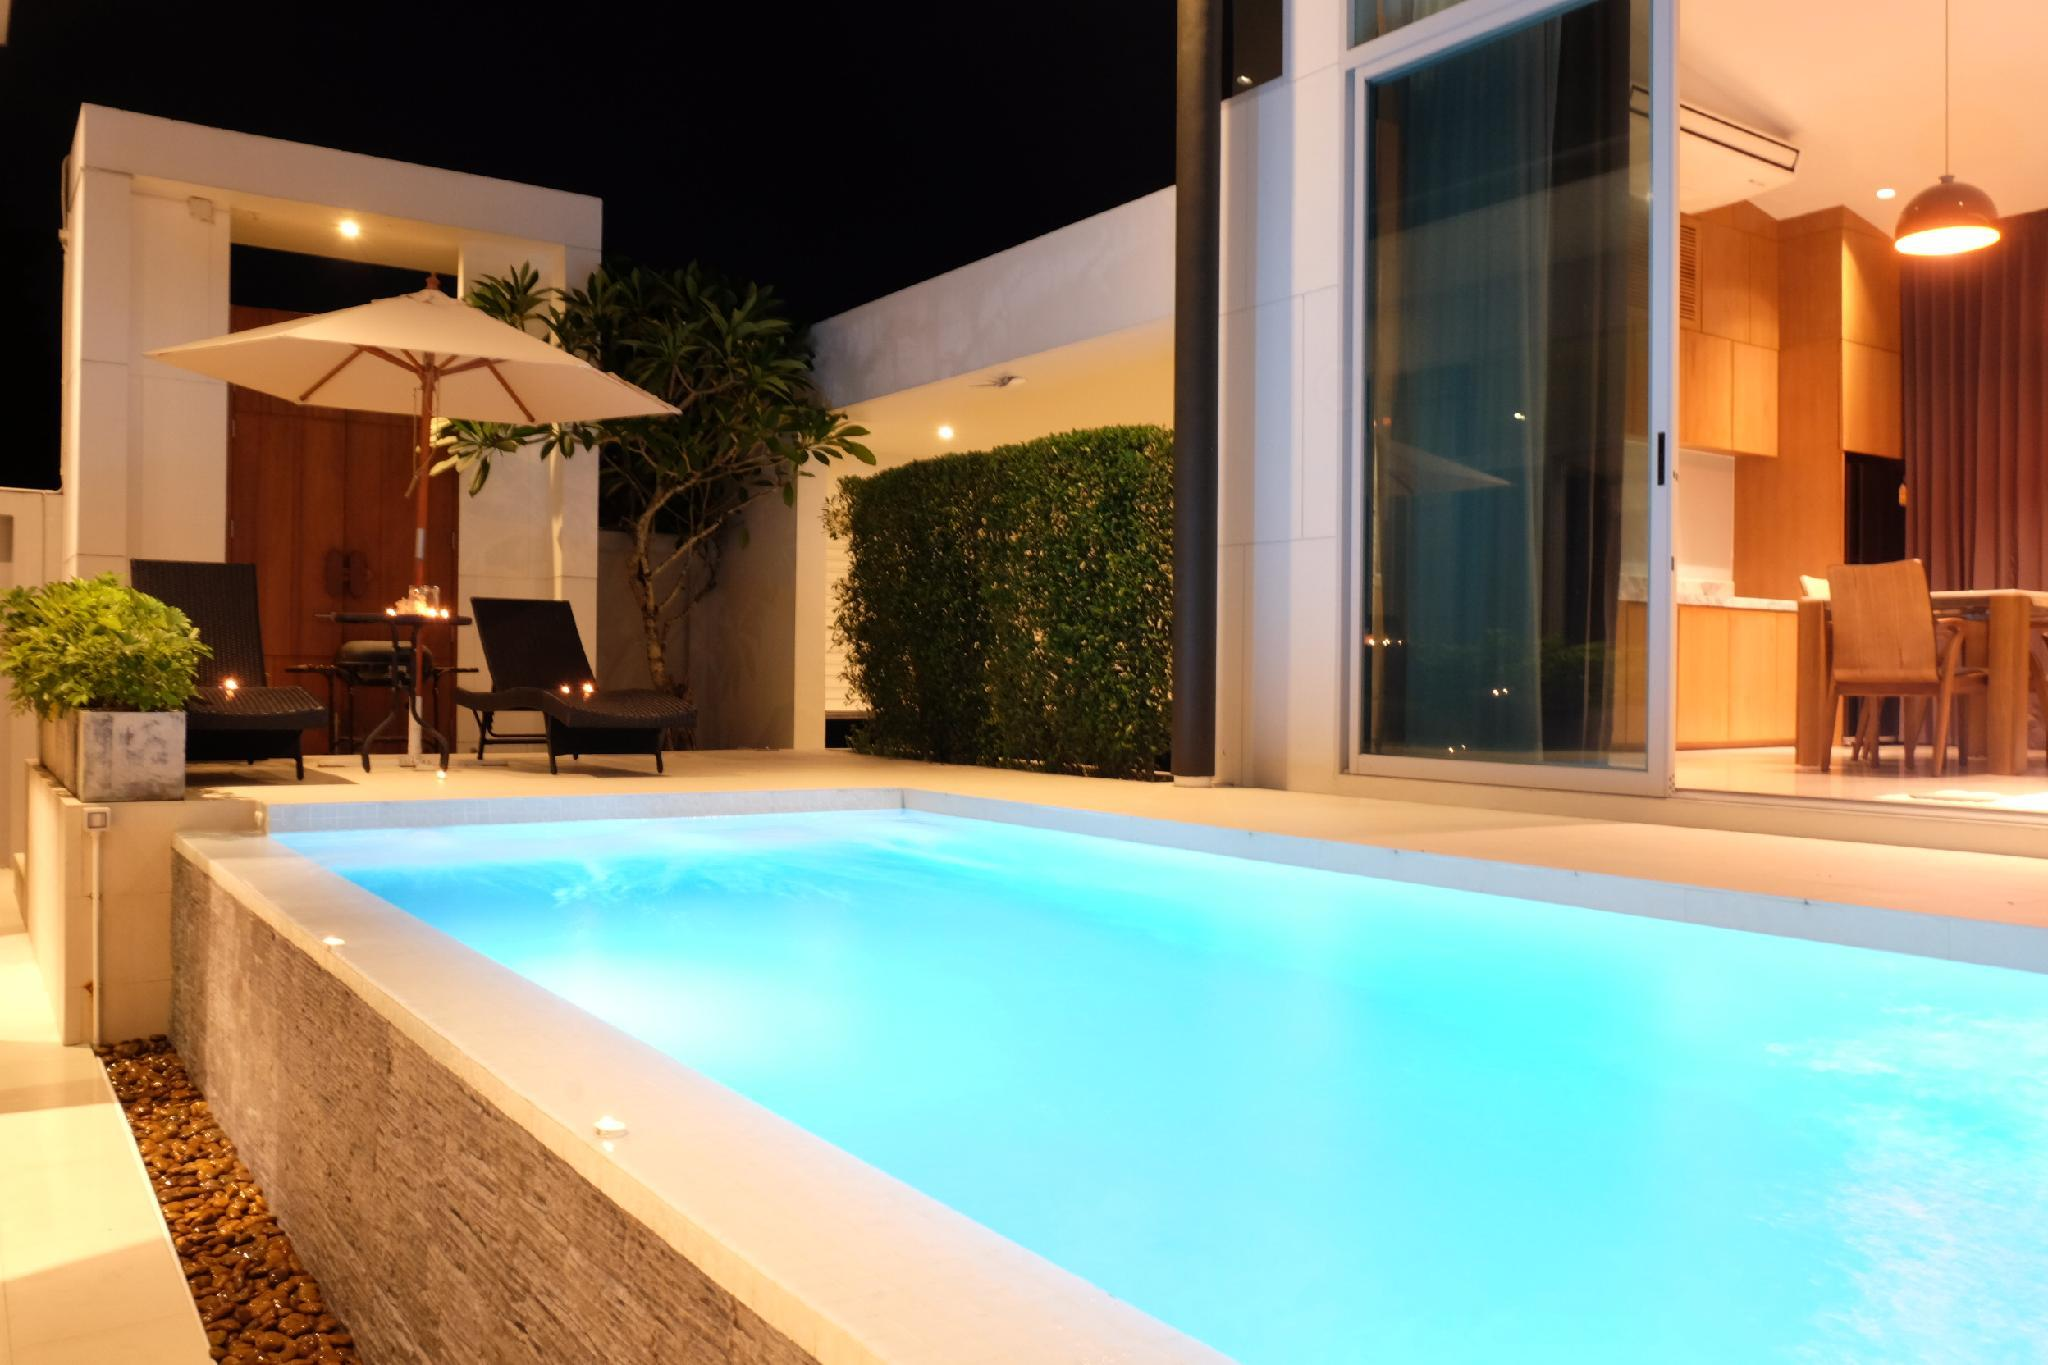 Tarton Bou Pool Villa Phuket